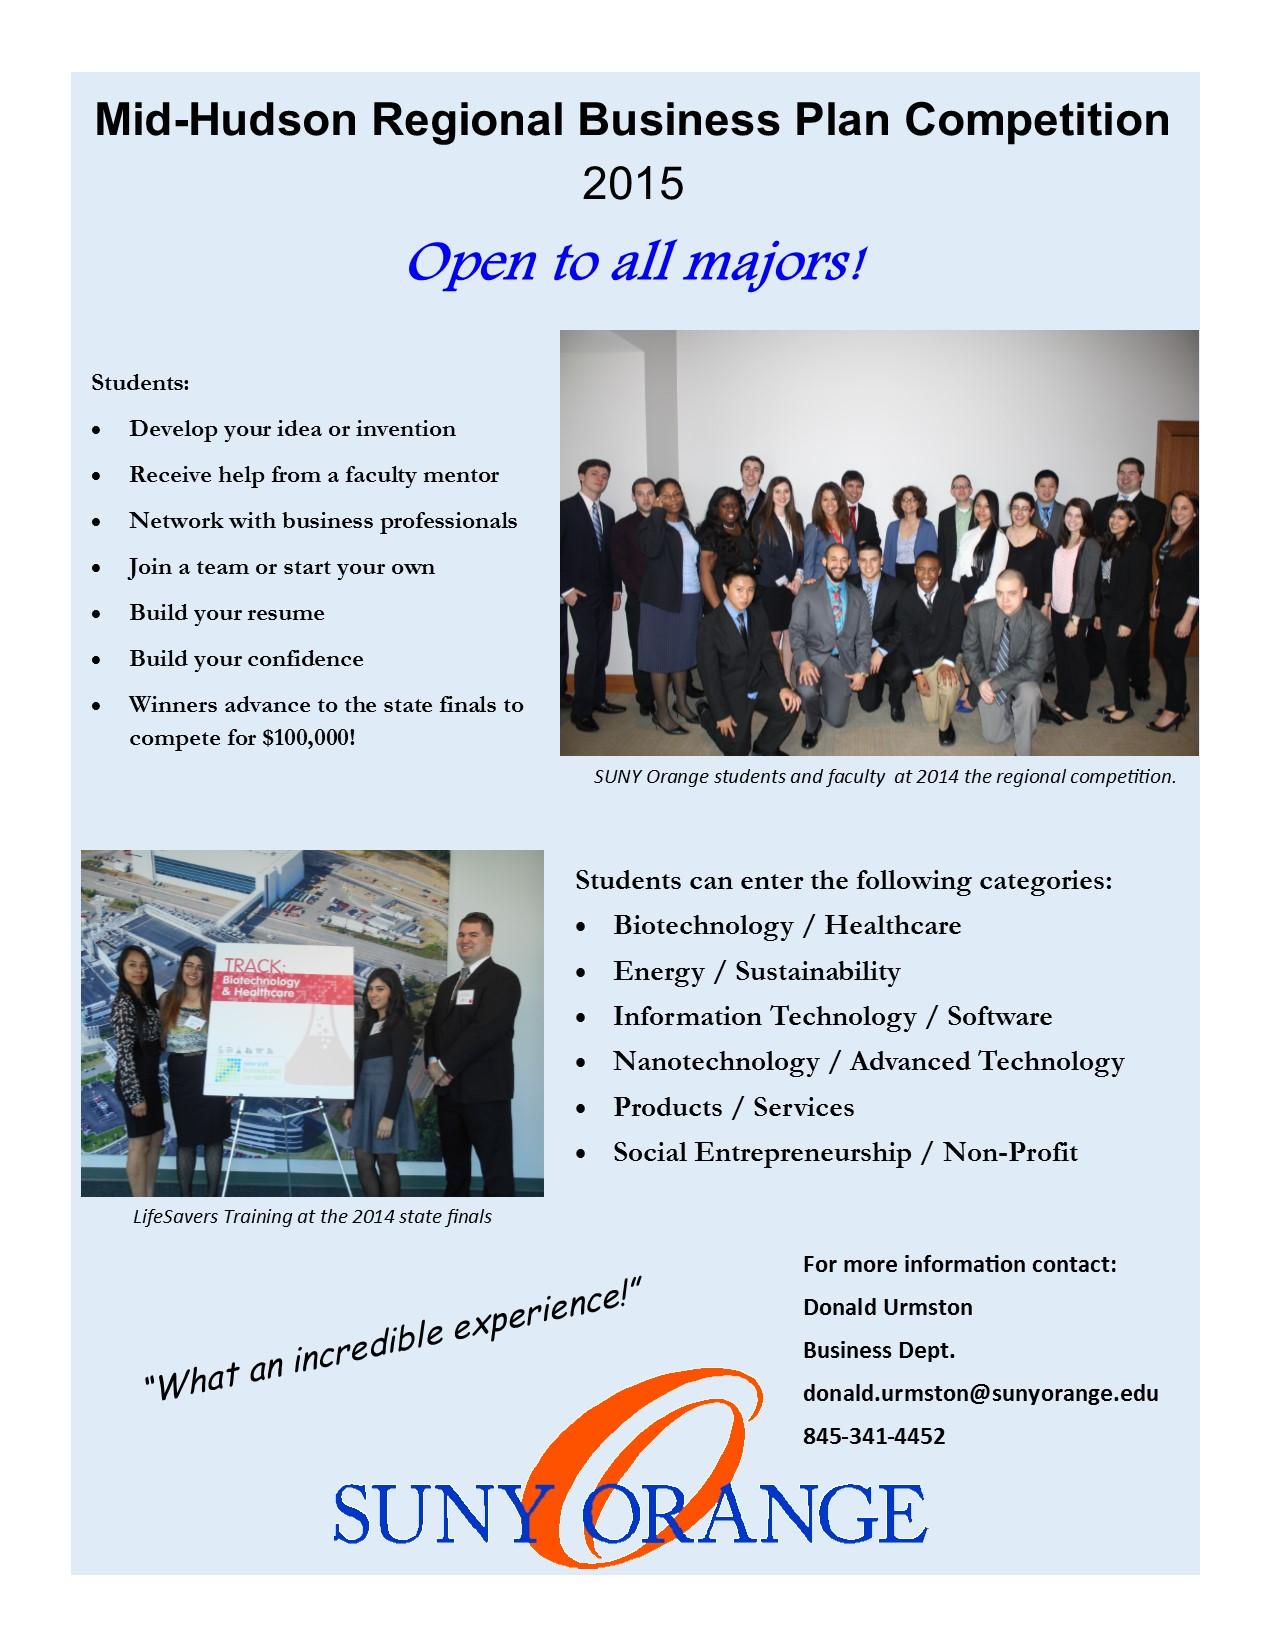 Mid-Hudson Innovation & Business Competition, SUNY Orange GRAPEVINE